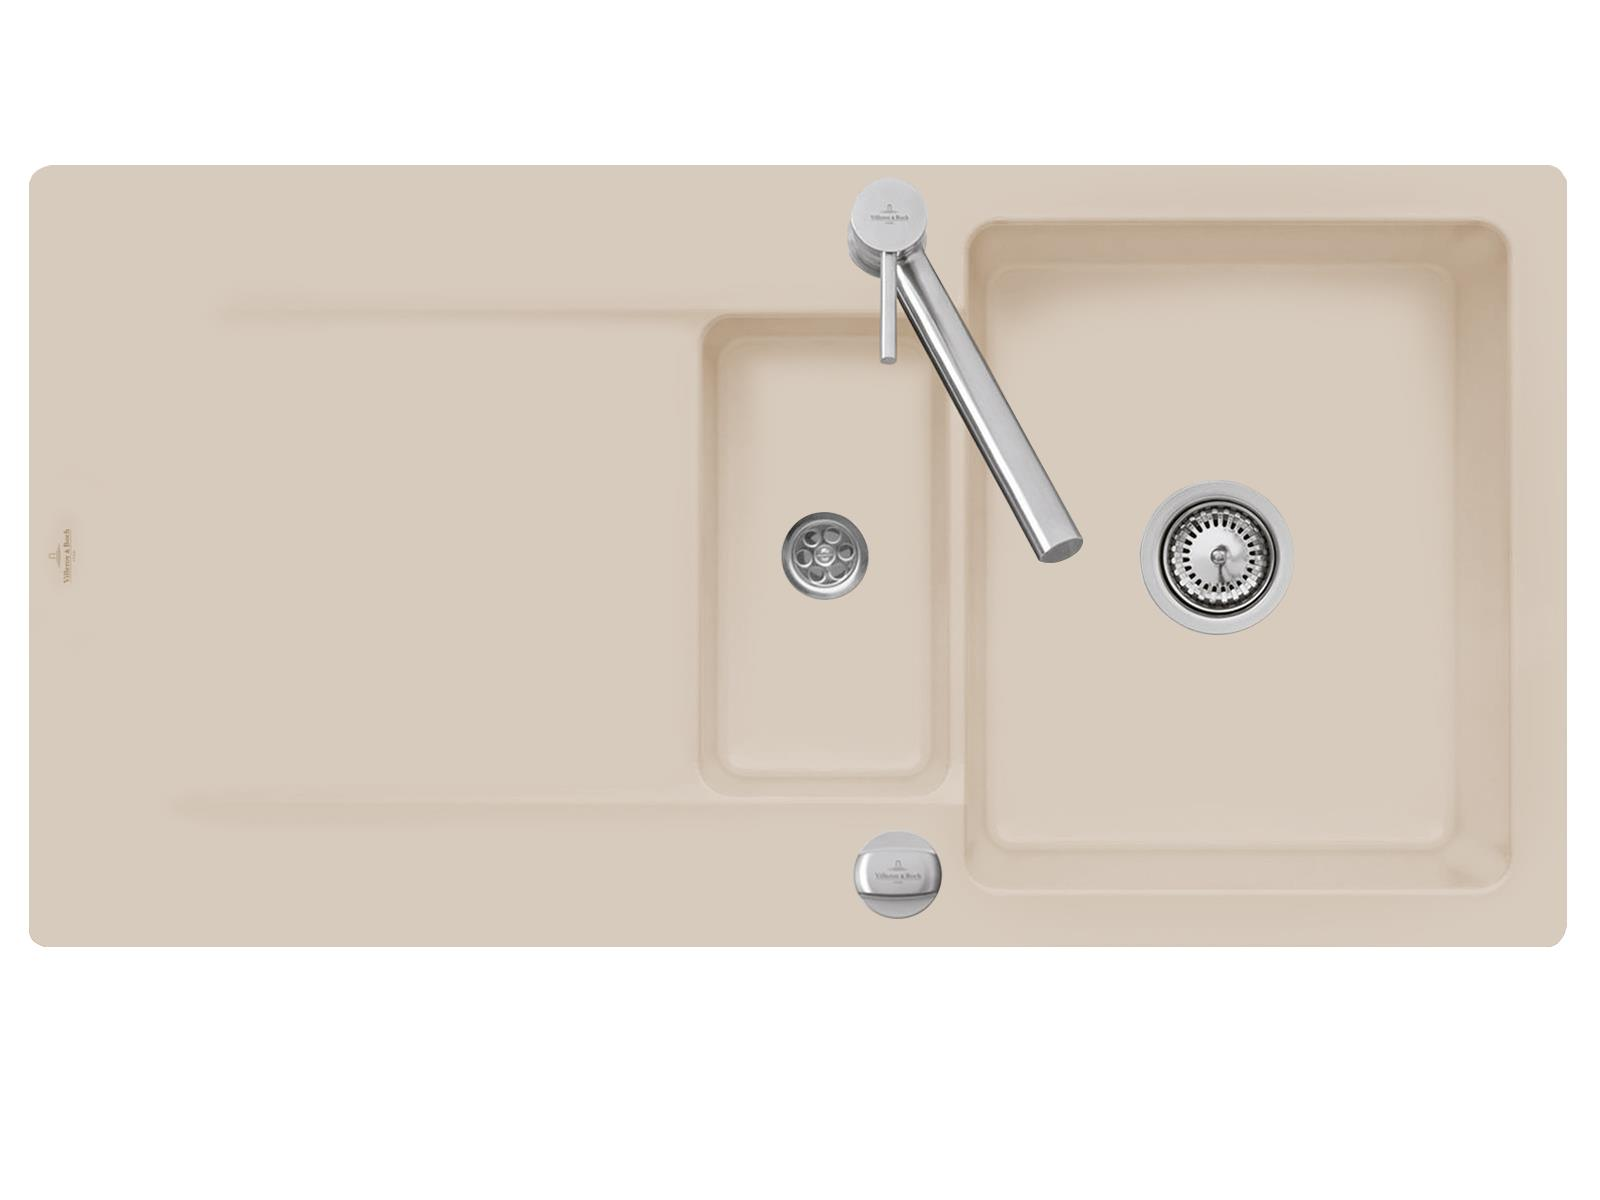 Villeroy & Boch Siluet 60 R - 3337 02 AM Almond Keramikspüle Exzenterbetätigung